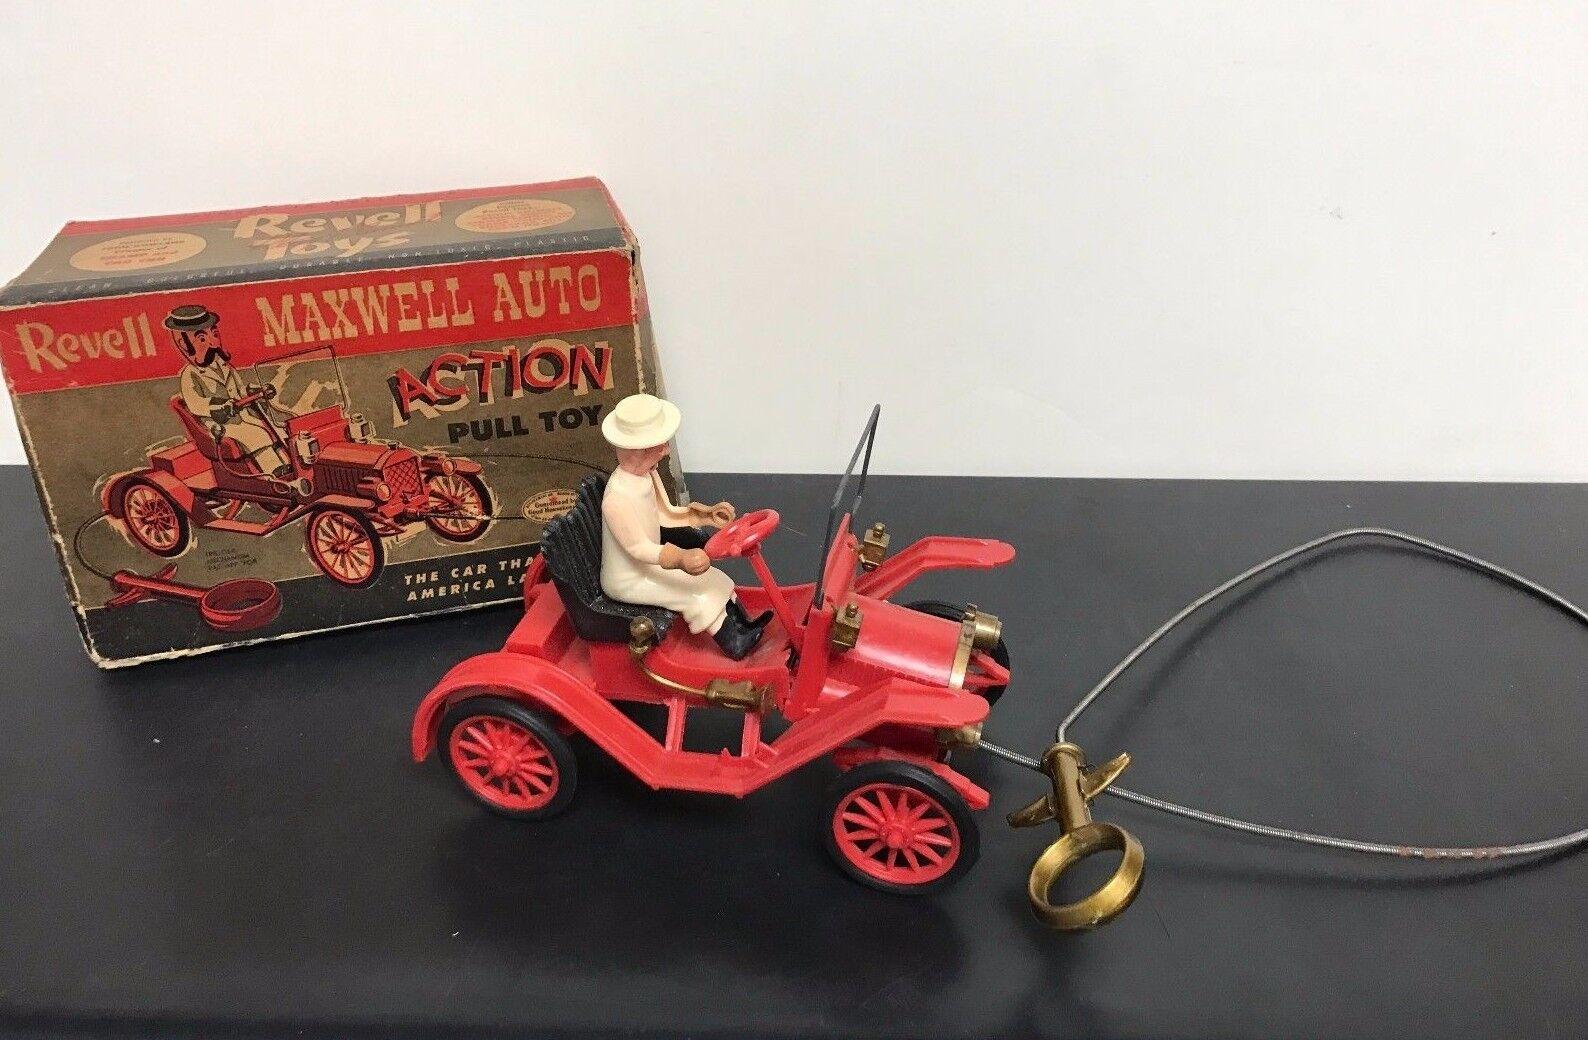 Vintage Revell Maxwell Auto acción Tire Coche De Juguete Con Caja Original